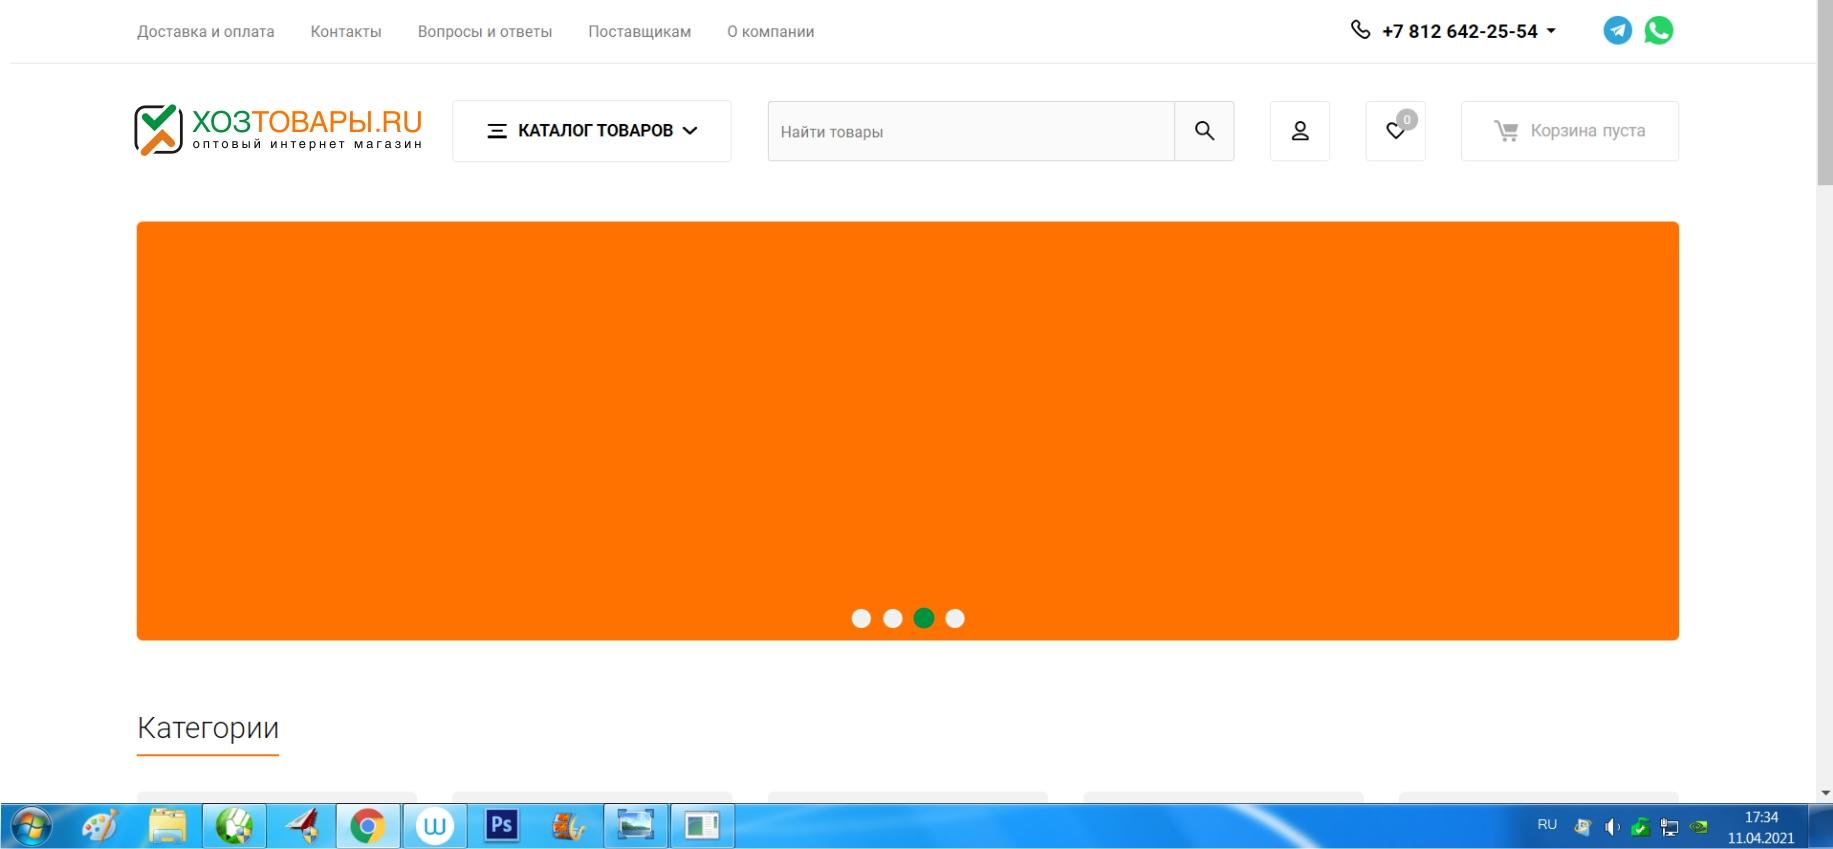 Разработка логотипа для оптового интернет-магазина «Хозтовары.ру» фото f_1126072f52f54298.jpg